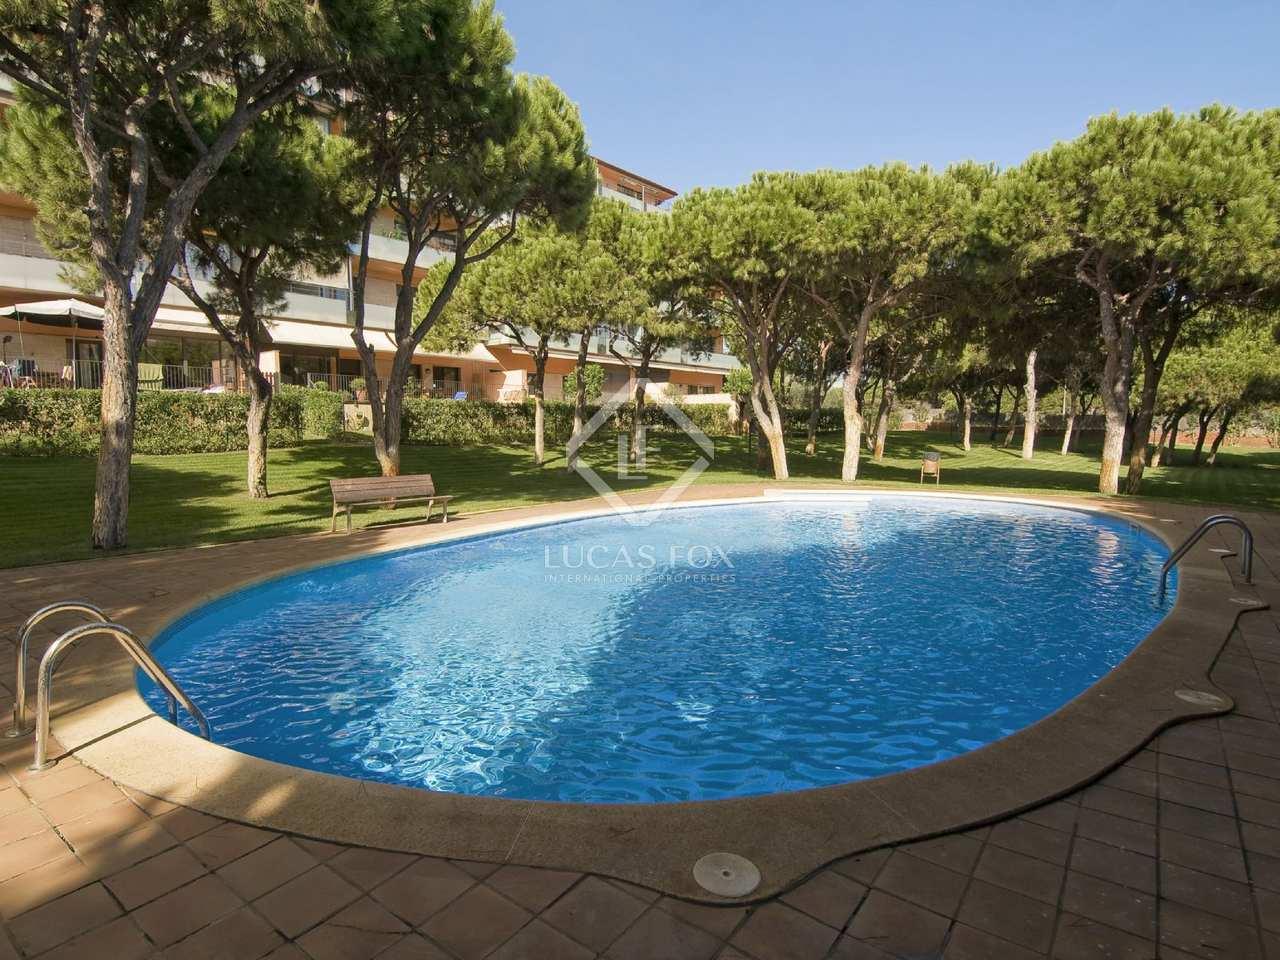 Moderno apartamento en venta en gav mar castelldefels for Piscina gava